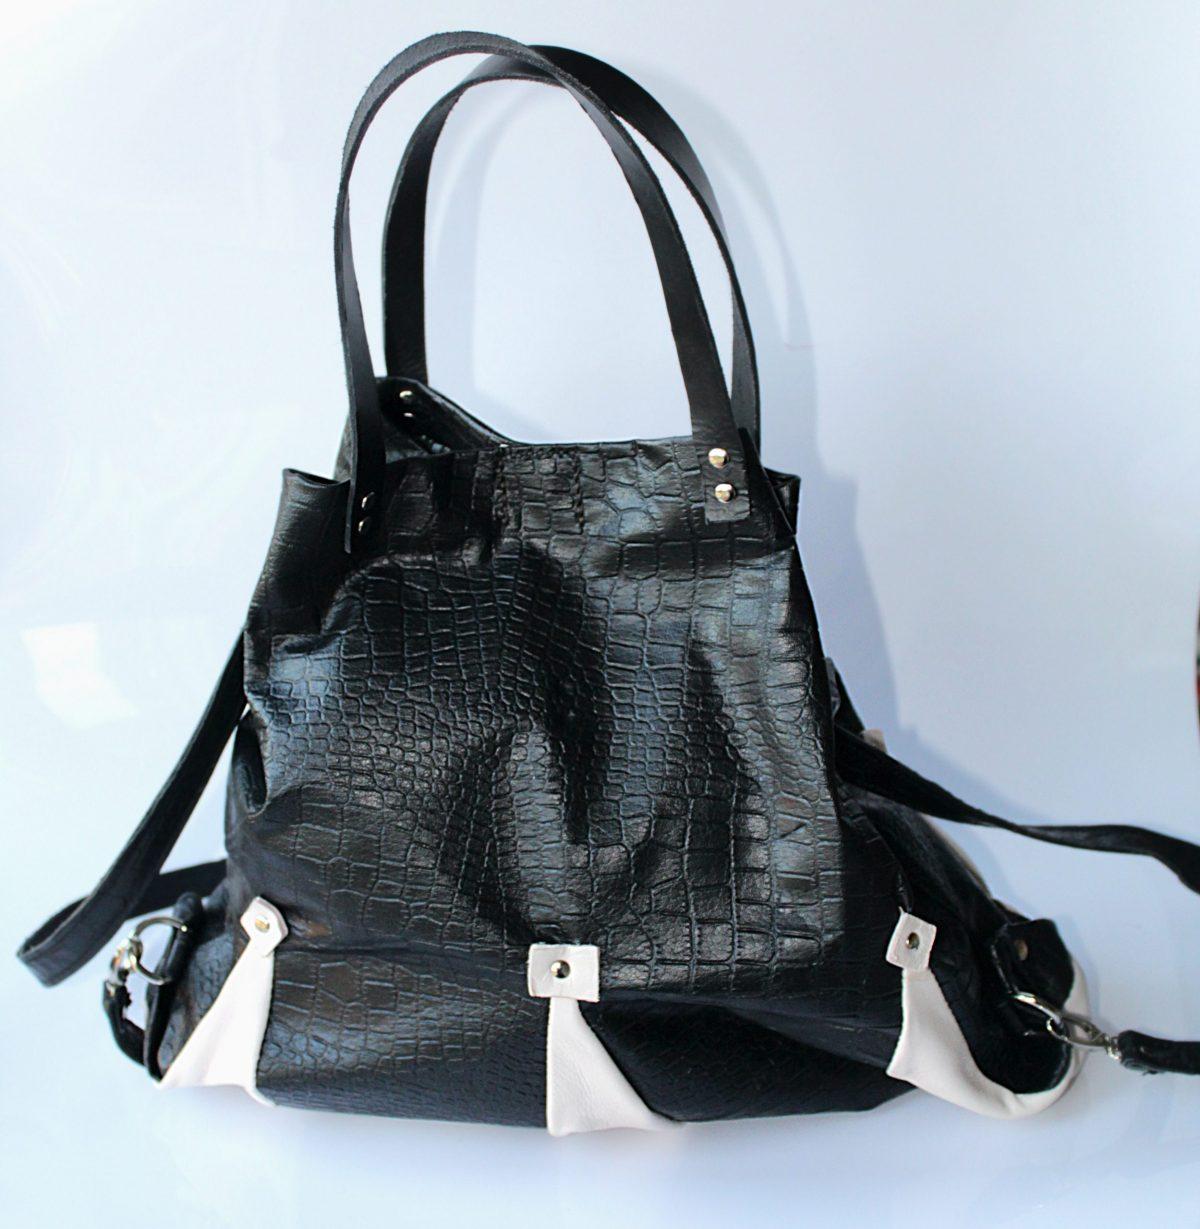 mochila en piel negra y blanca